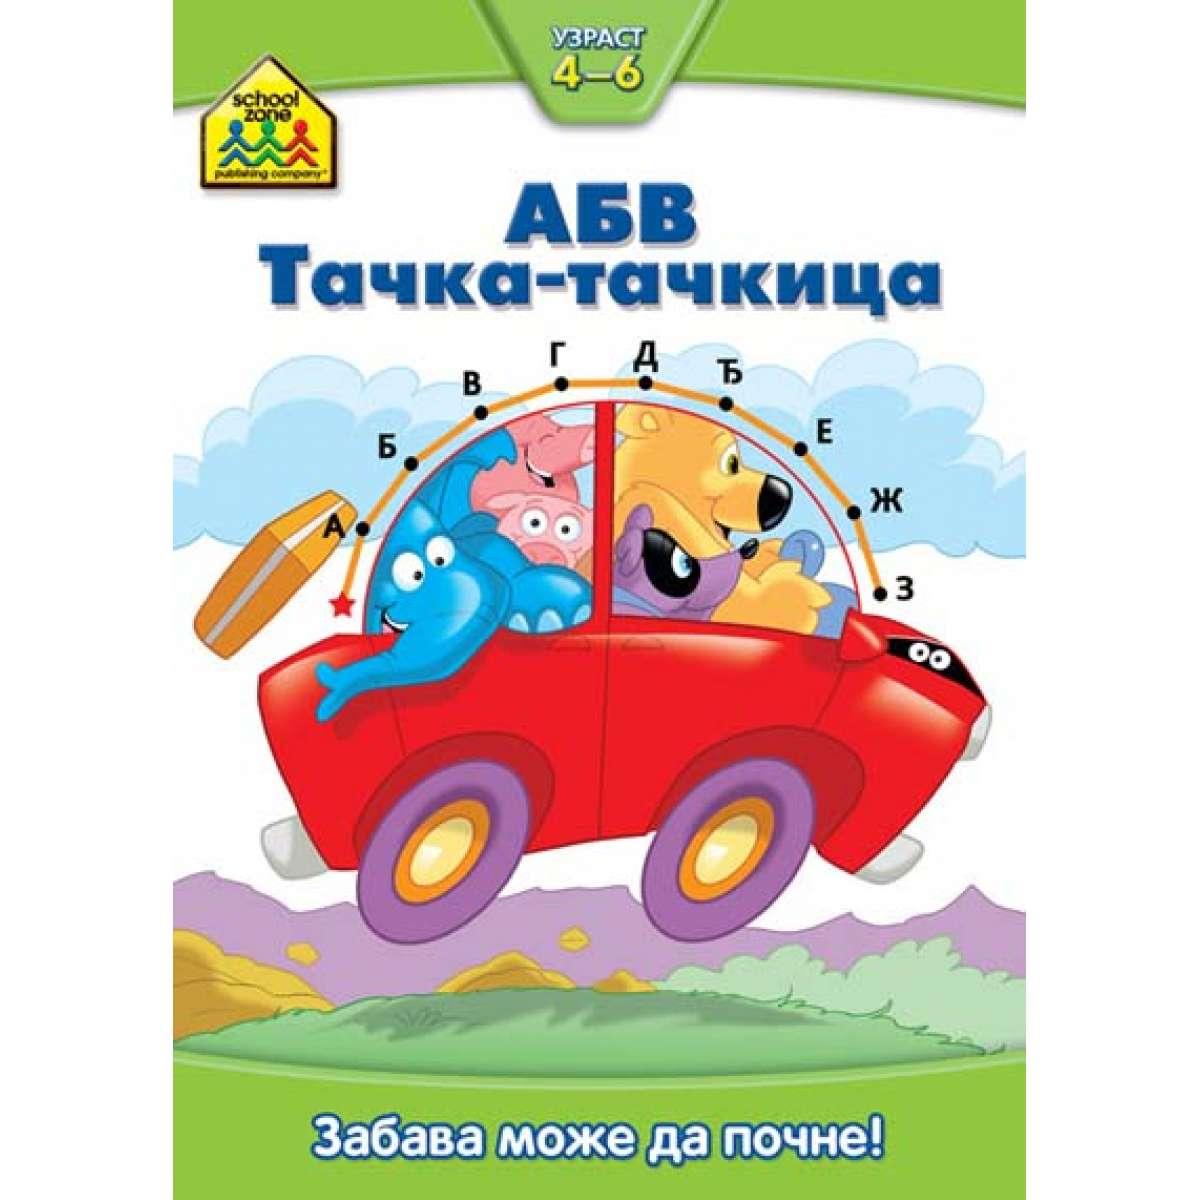 Vulkančićeva škola: ABV TAČKA - TAČKICA